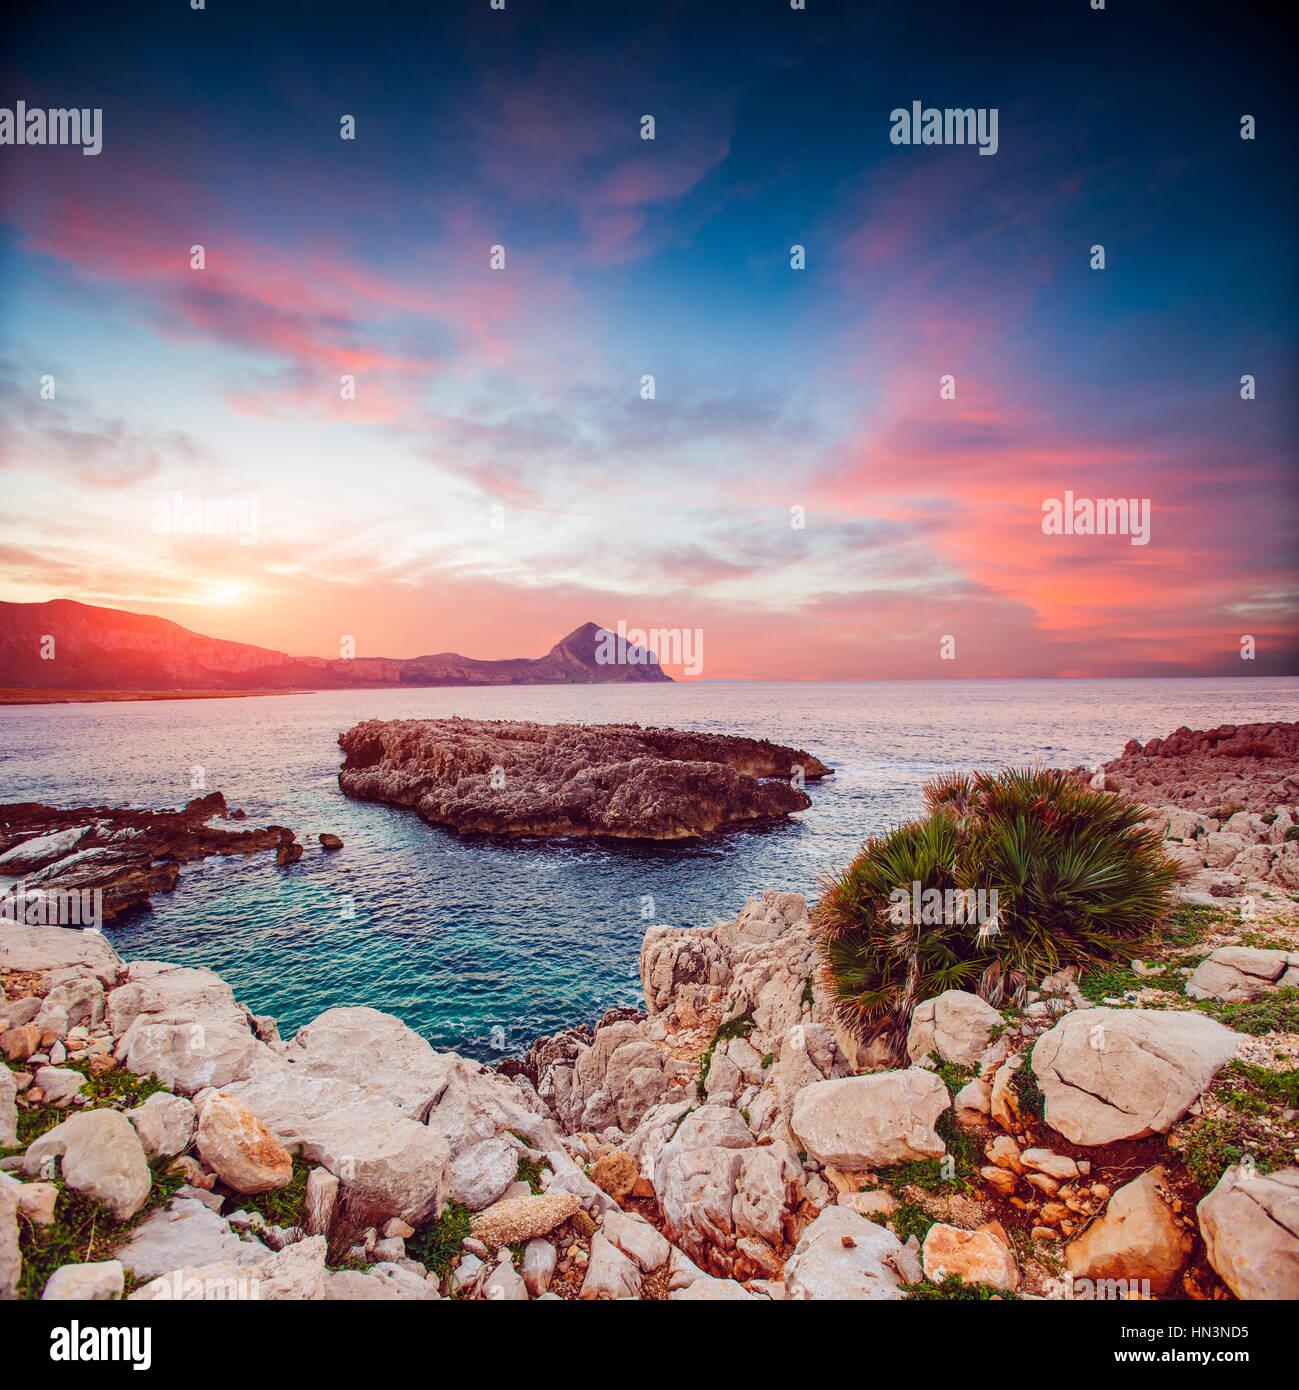 Sea coast at sunset - Stock Image